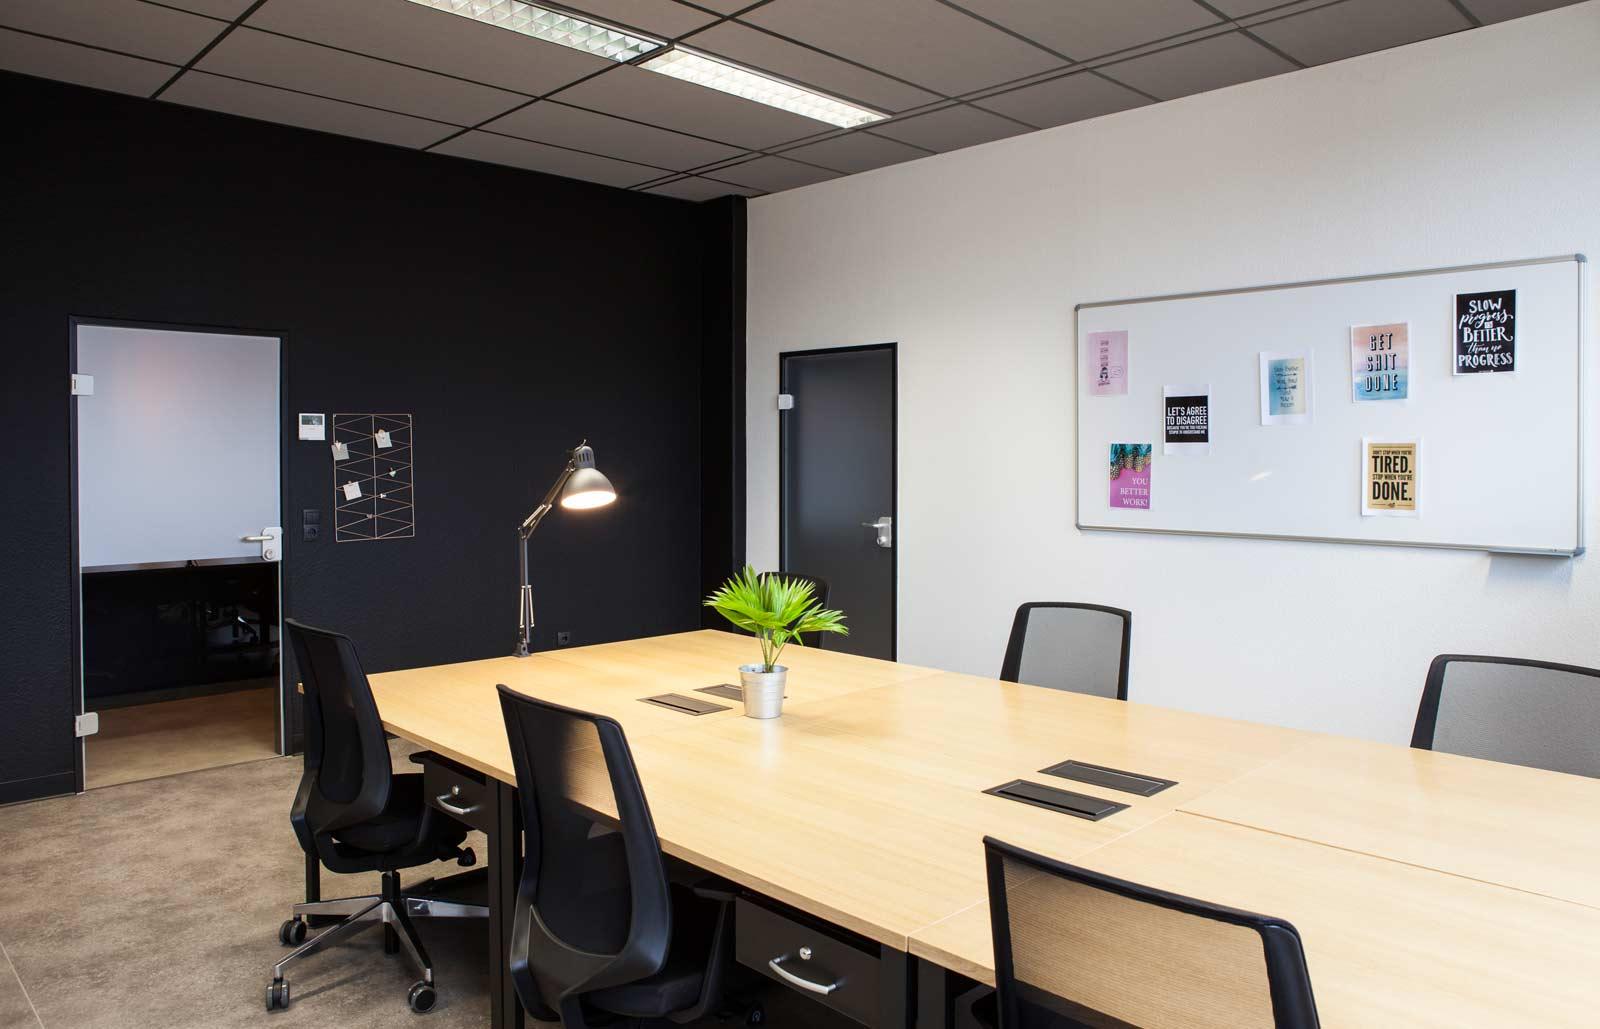 Bremen Coworking Office Spaces In Der Martinistrasse 62 66